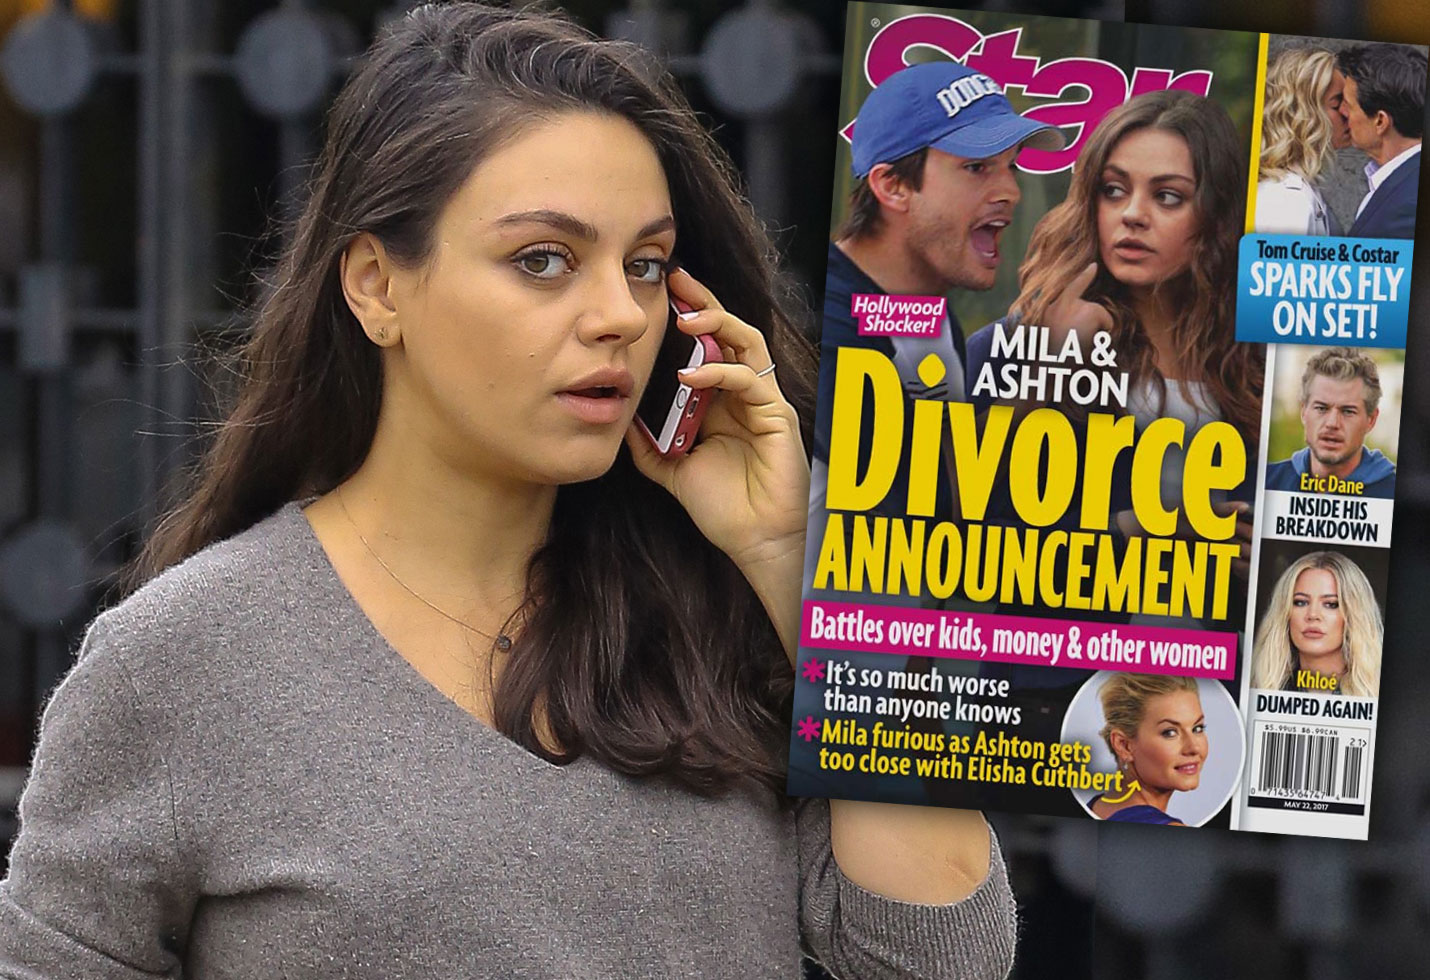 Ashton Kutcher And Mila Kunis Wedding.Inside Ashton Kutcher Mila Kunis Shocking Marriage Meltdown